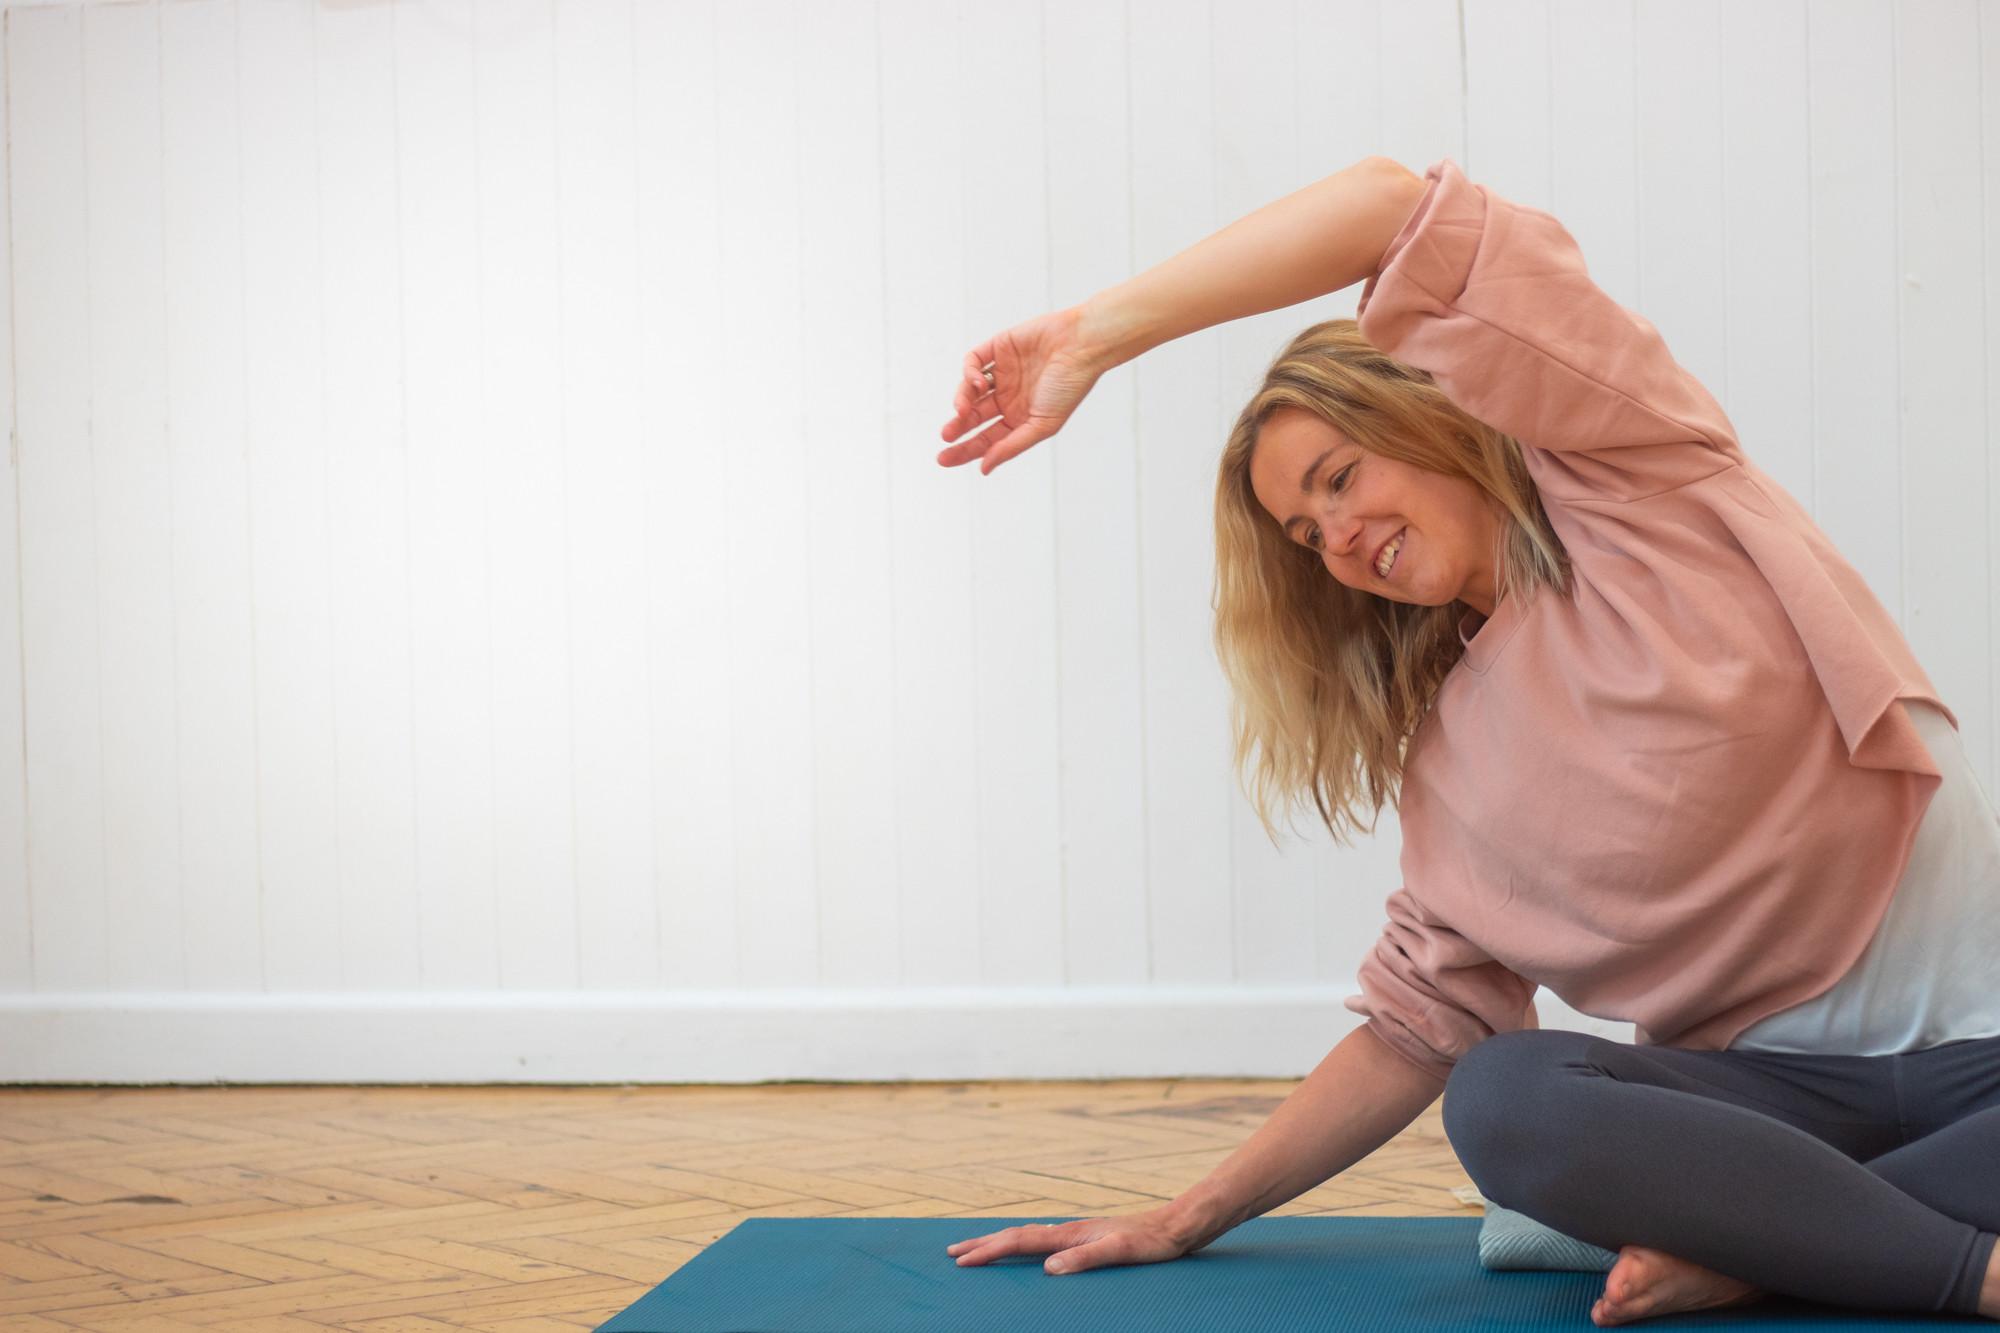 Weds 7.30pm Yoga: Move. Breathe. Rest.